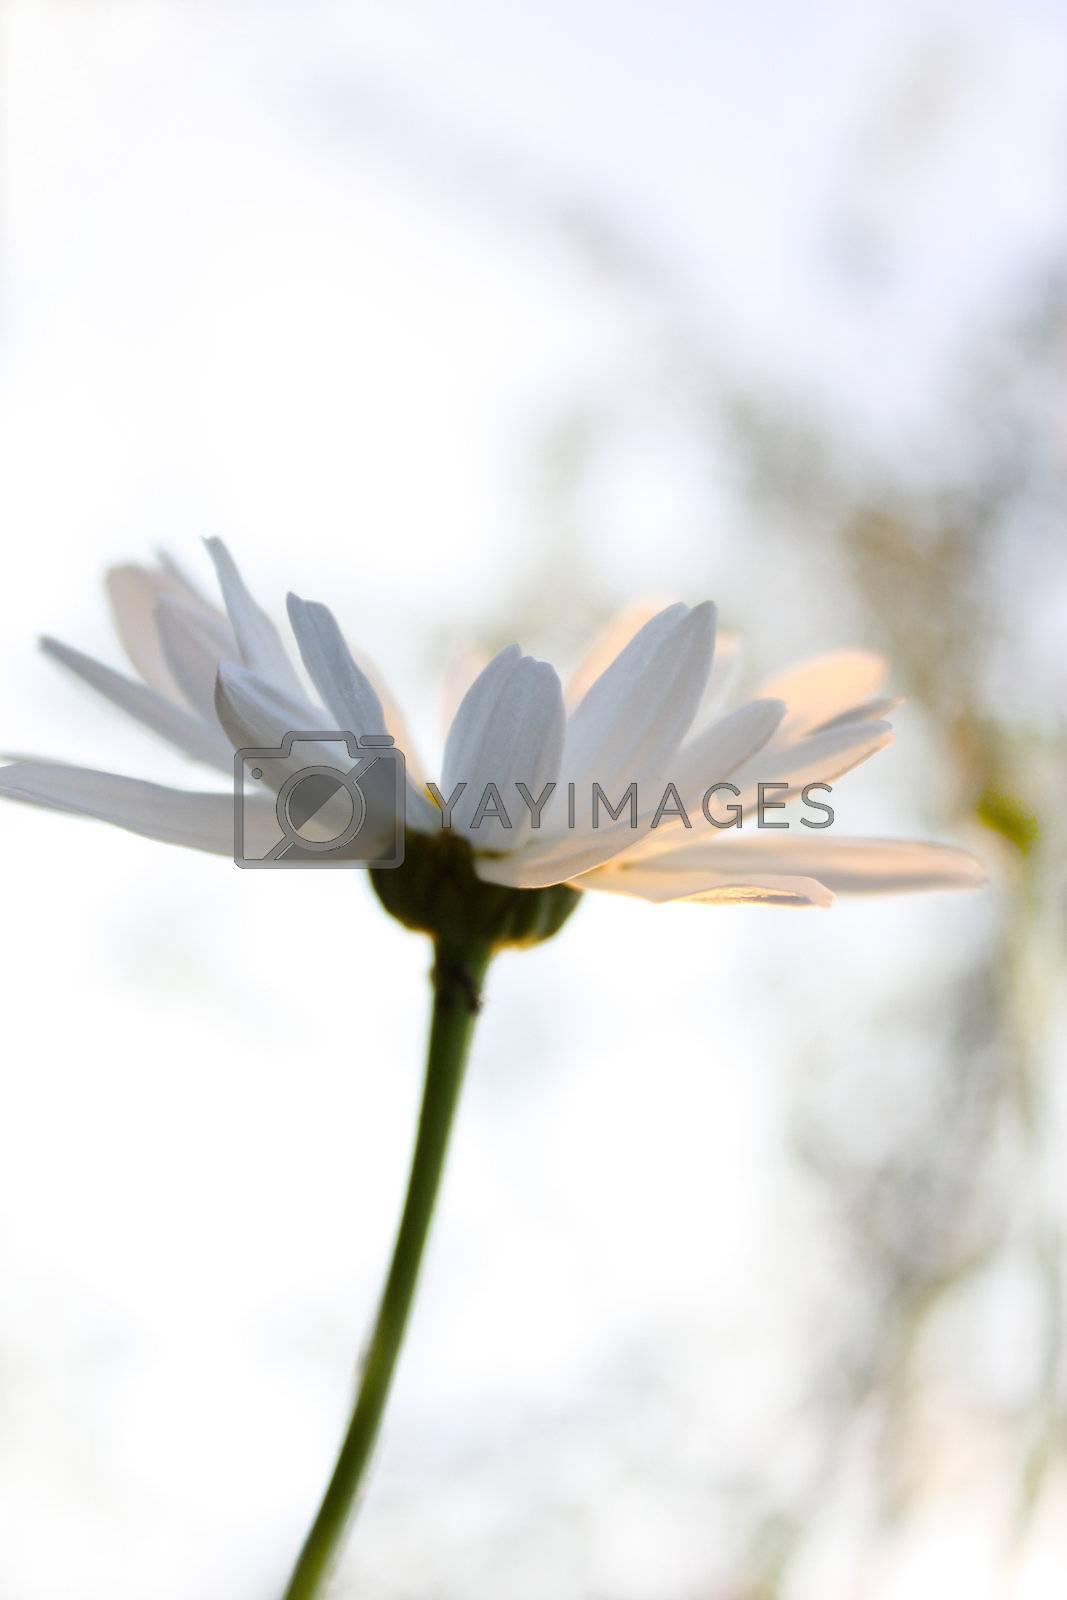 Royalty free image of daisy by Lyudmila